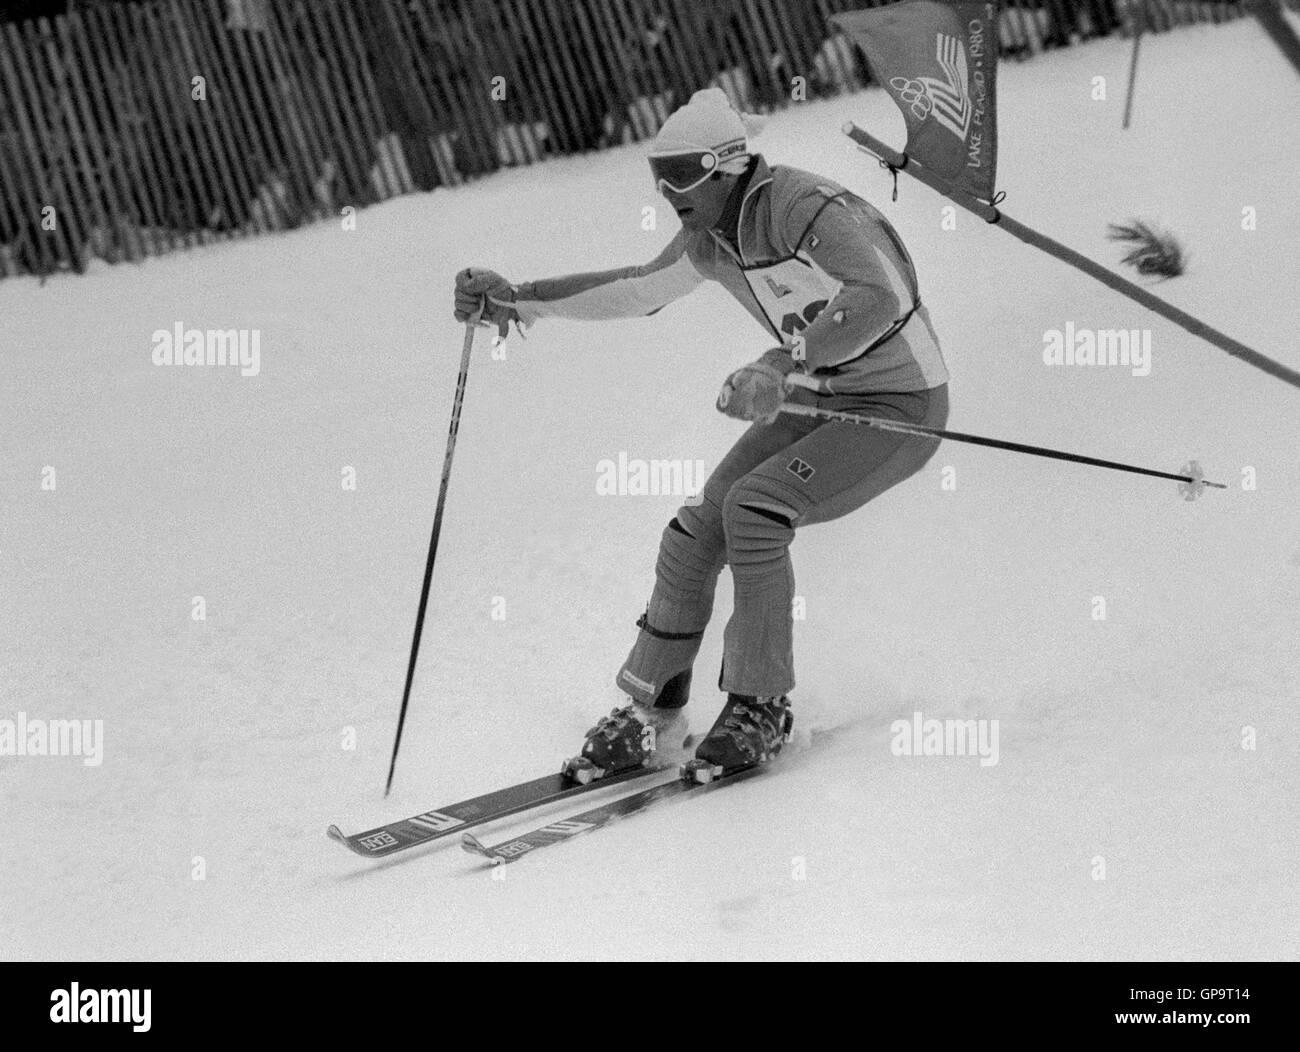 INGEMAR STENMARK Swedish alpine skier - Stock Image